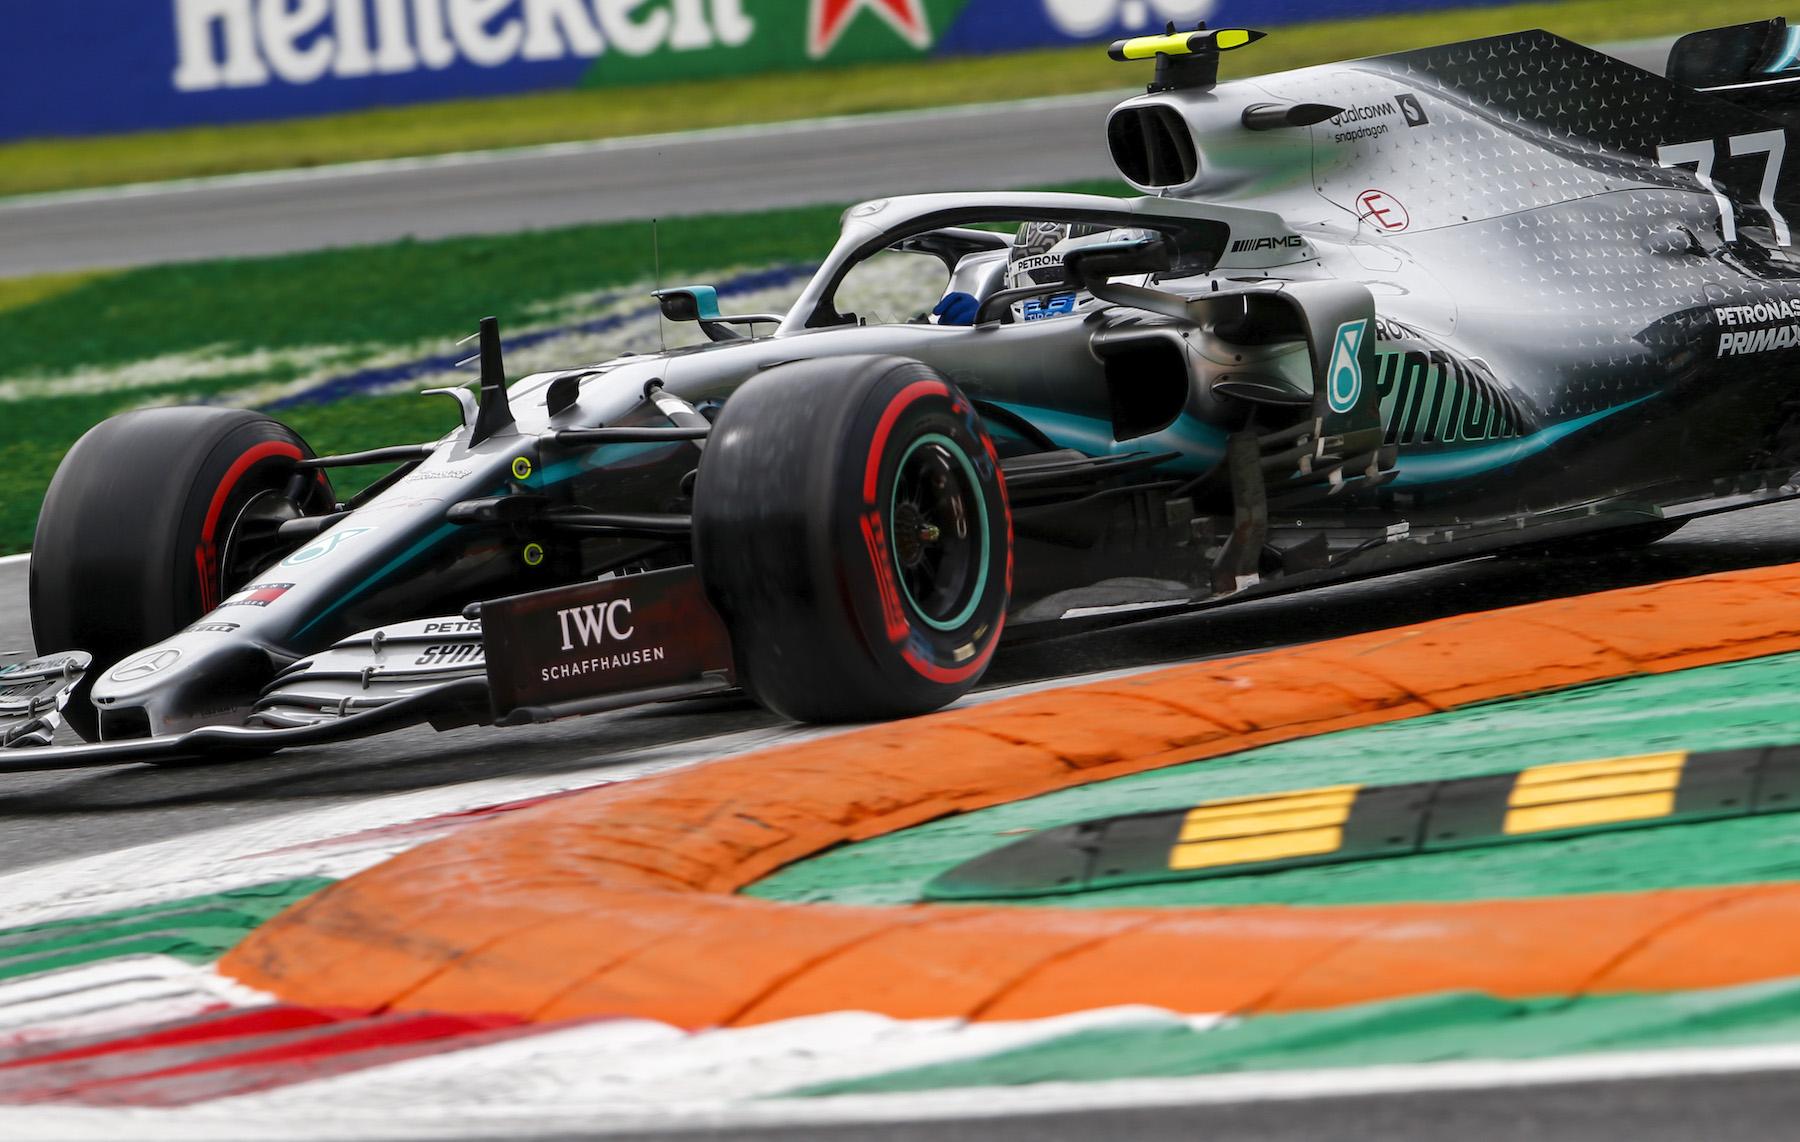 1 2019 Italian GP Friday 38.jpg